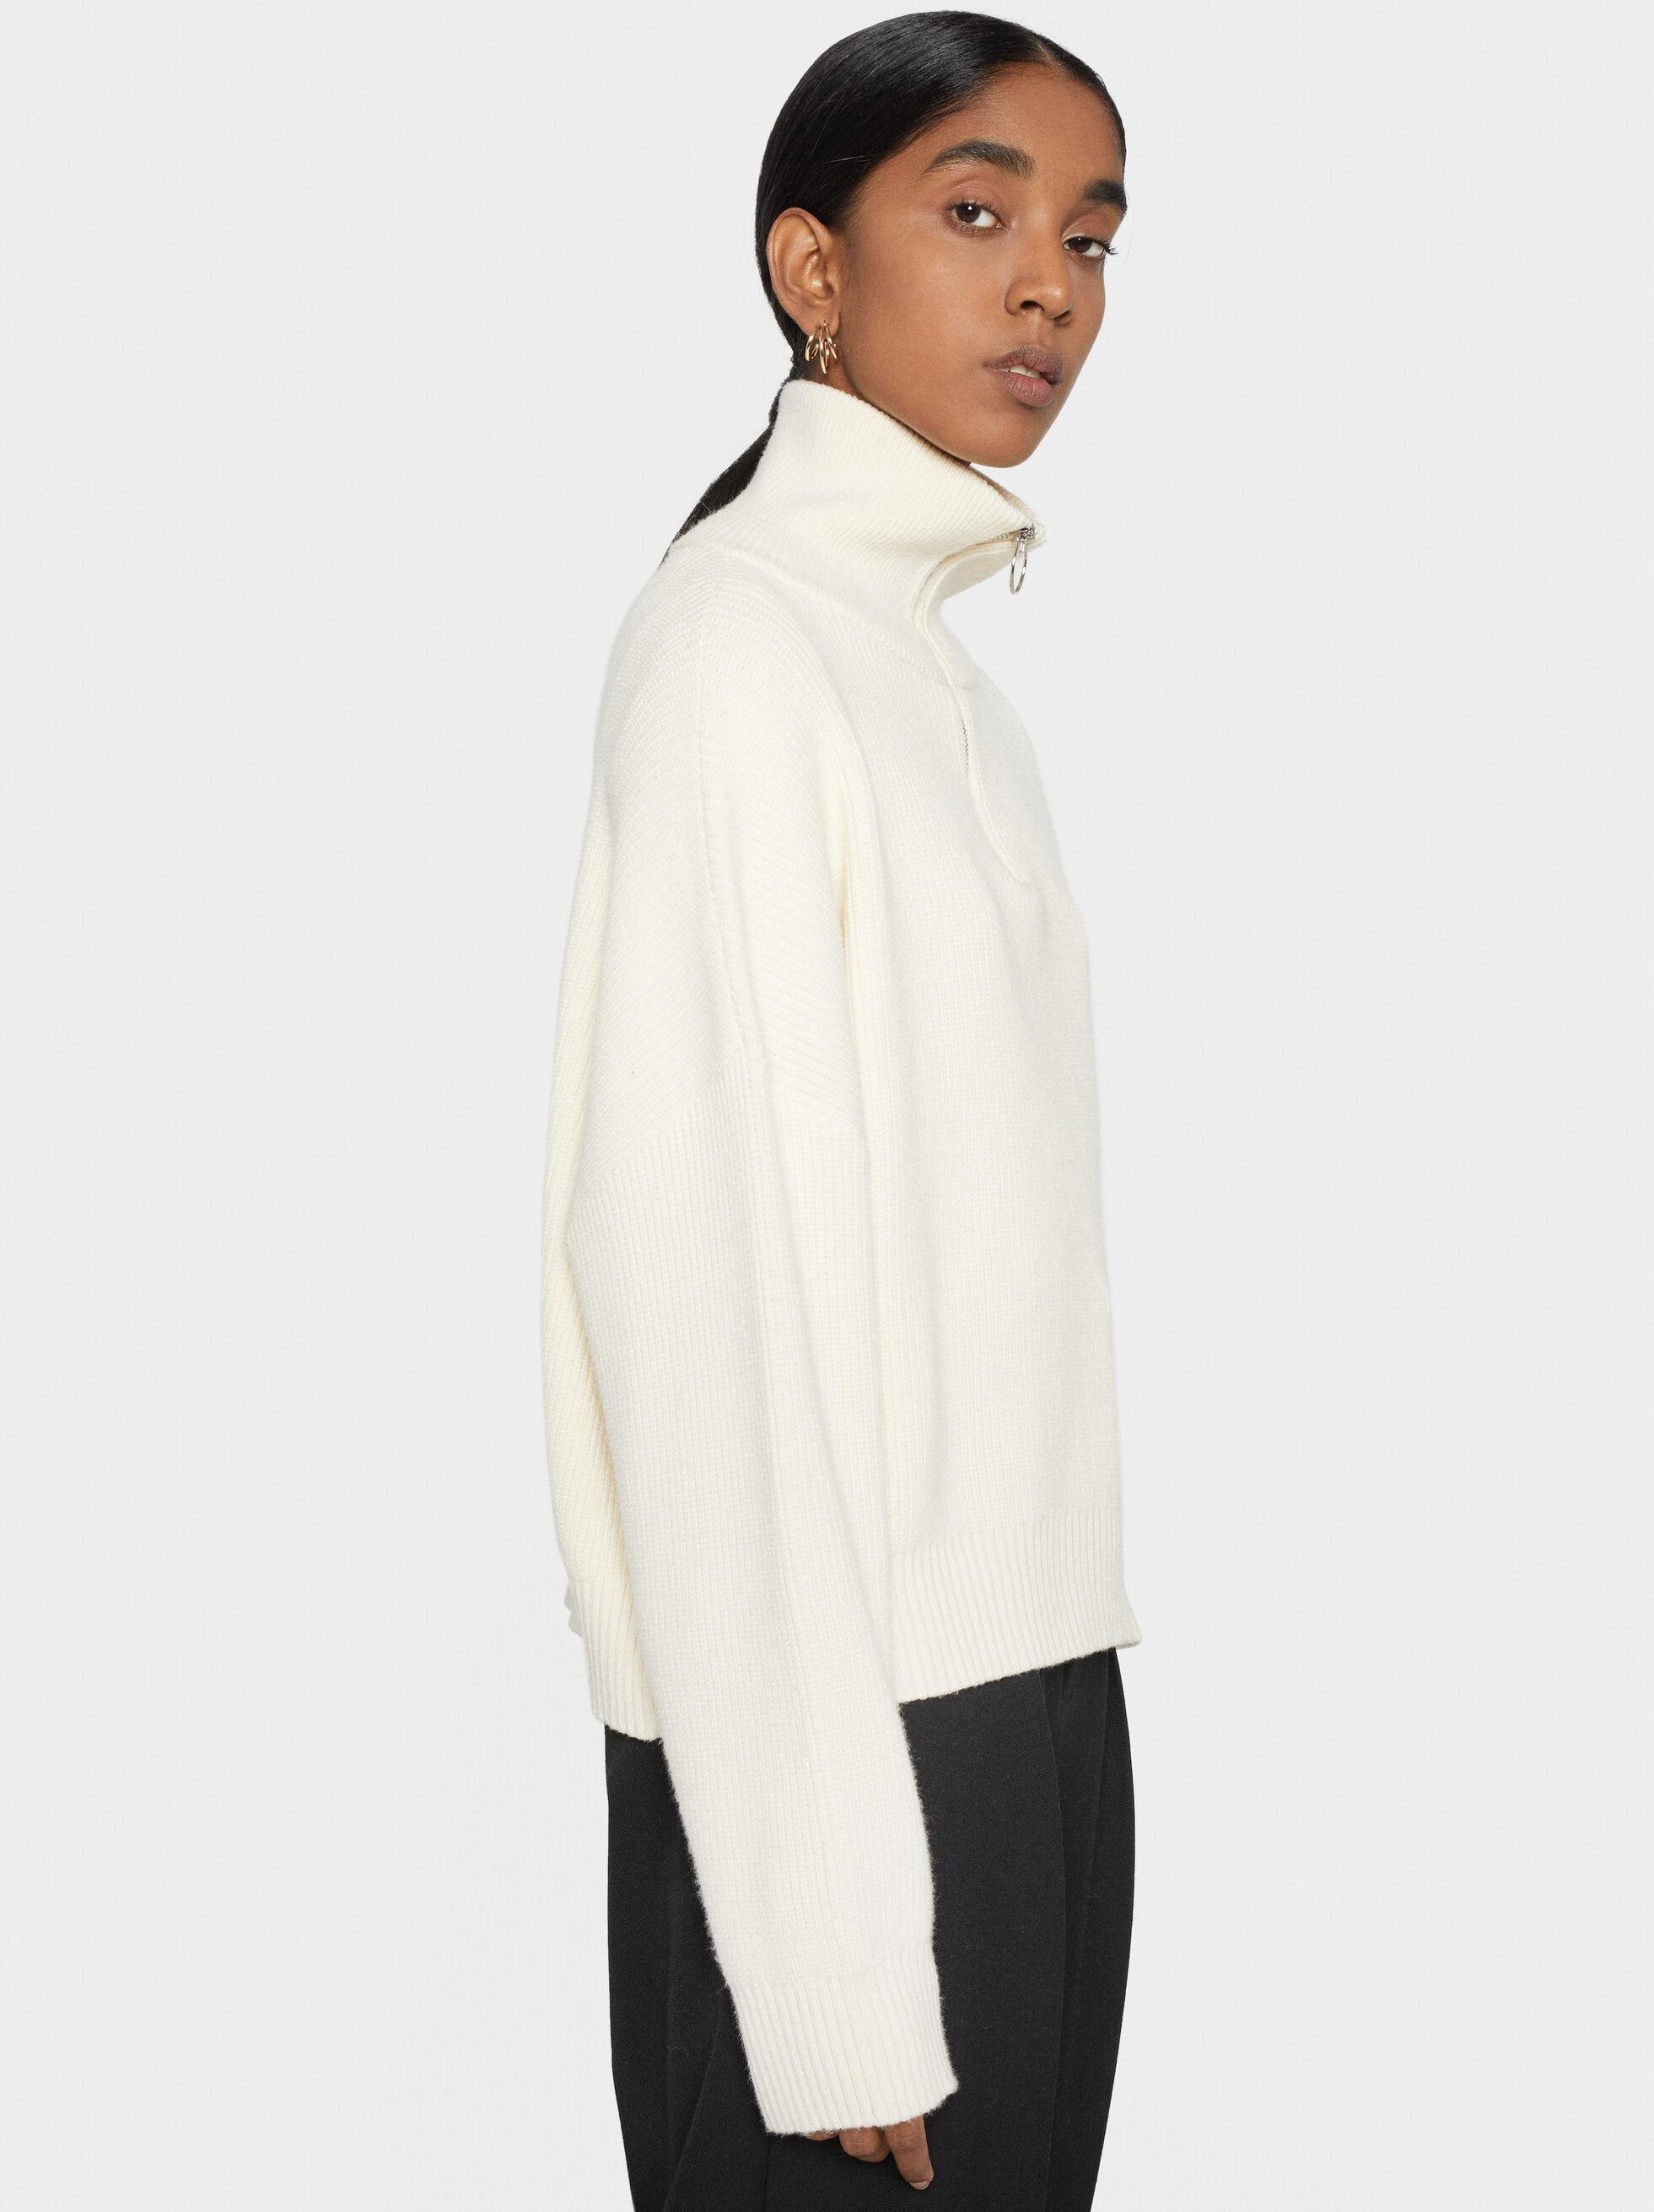 Knit Sweater With Zip, Ecru, hi-res